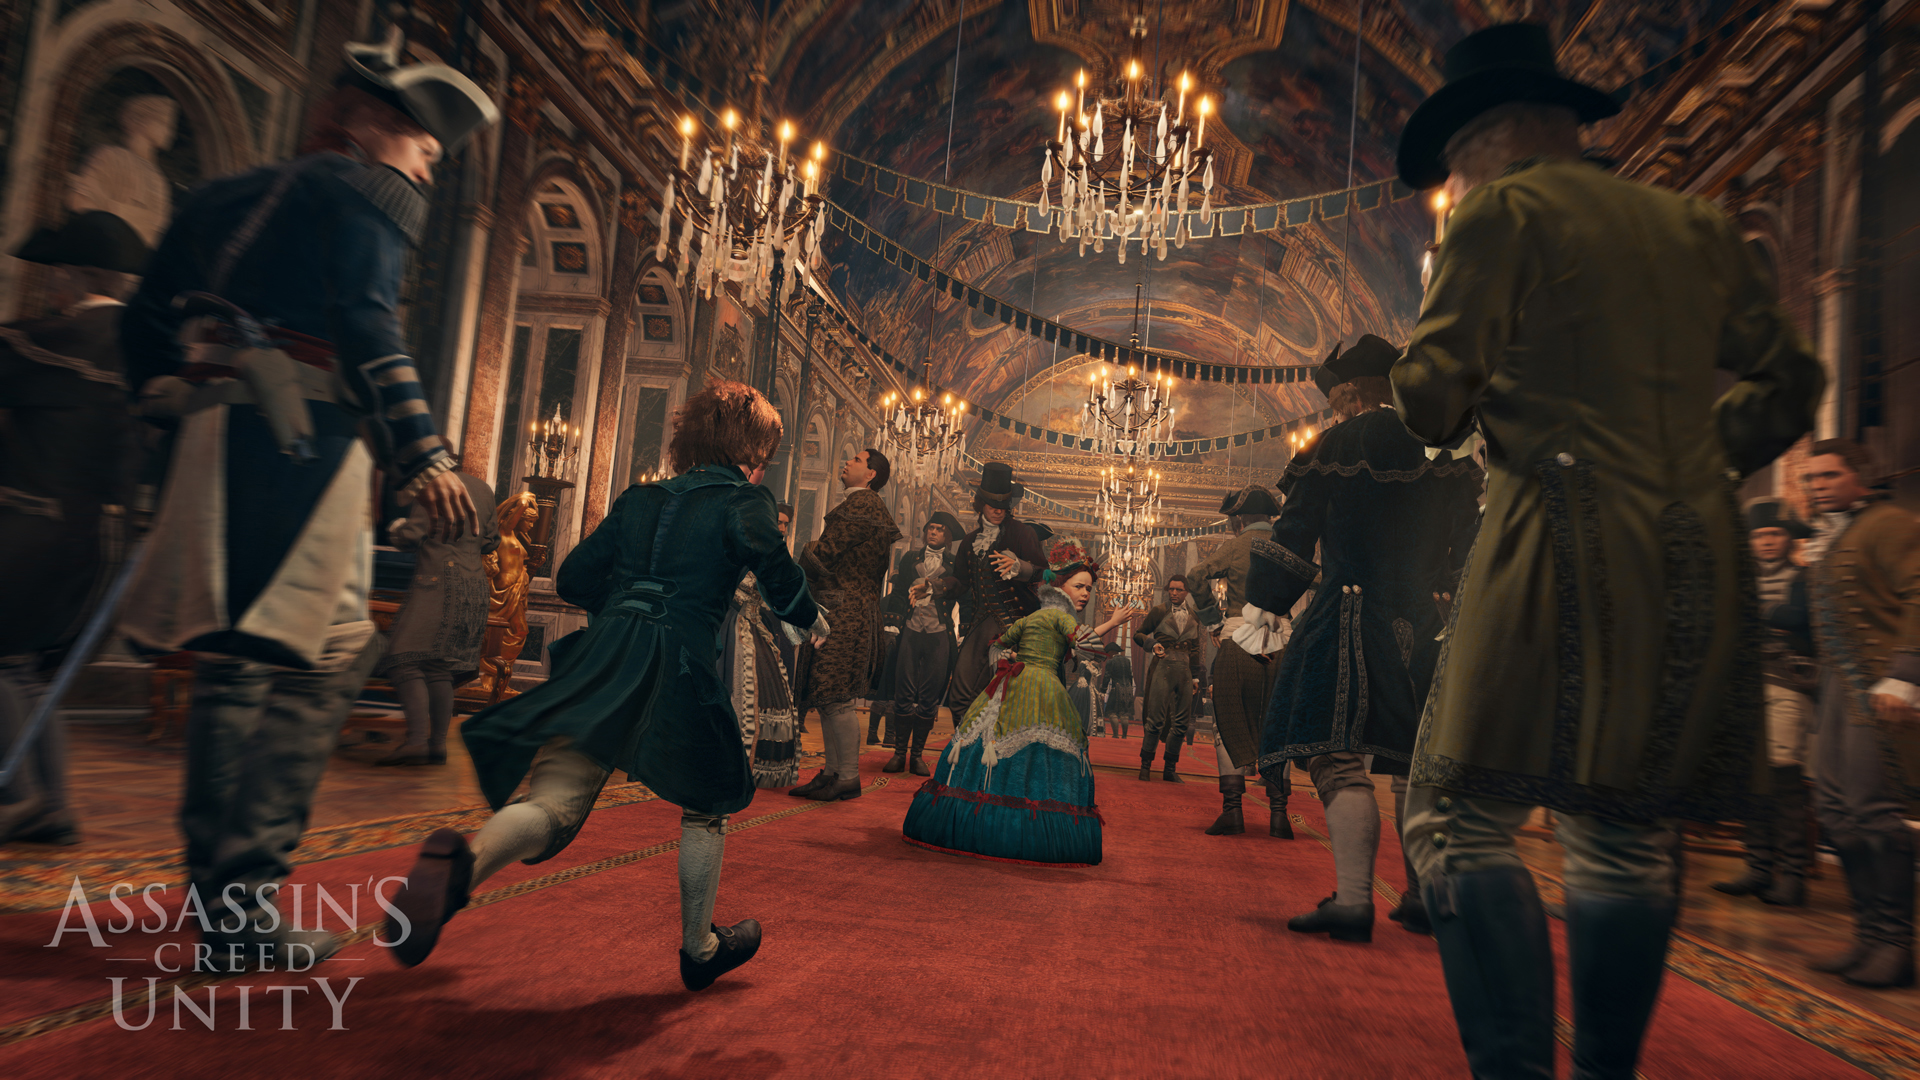 [FIXO] Assassin's Creed Unity Assassin%27s_Creed_Unity_ArnoAndElise_Children_166313